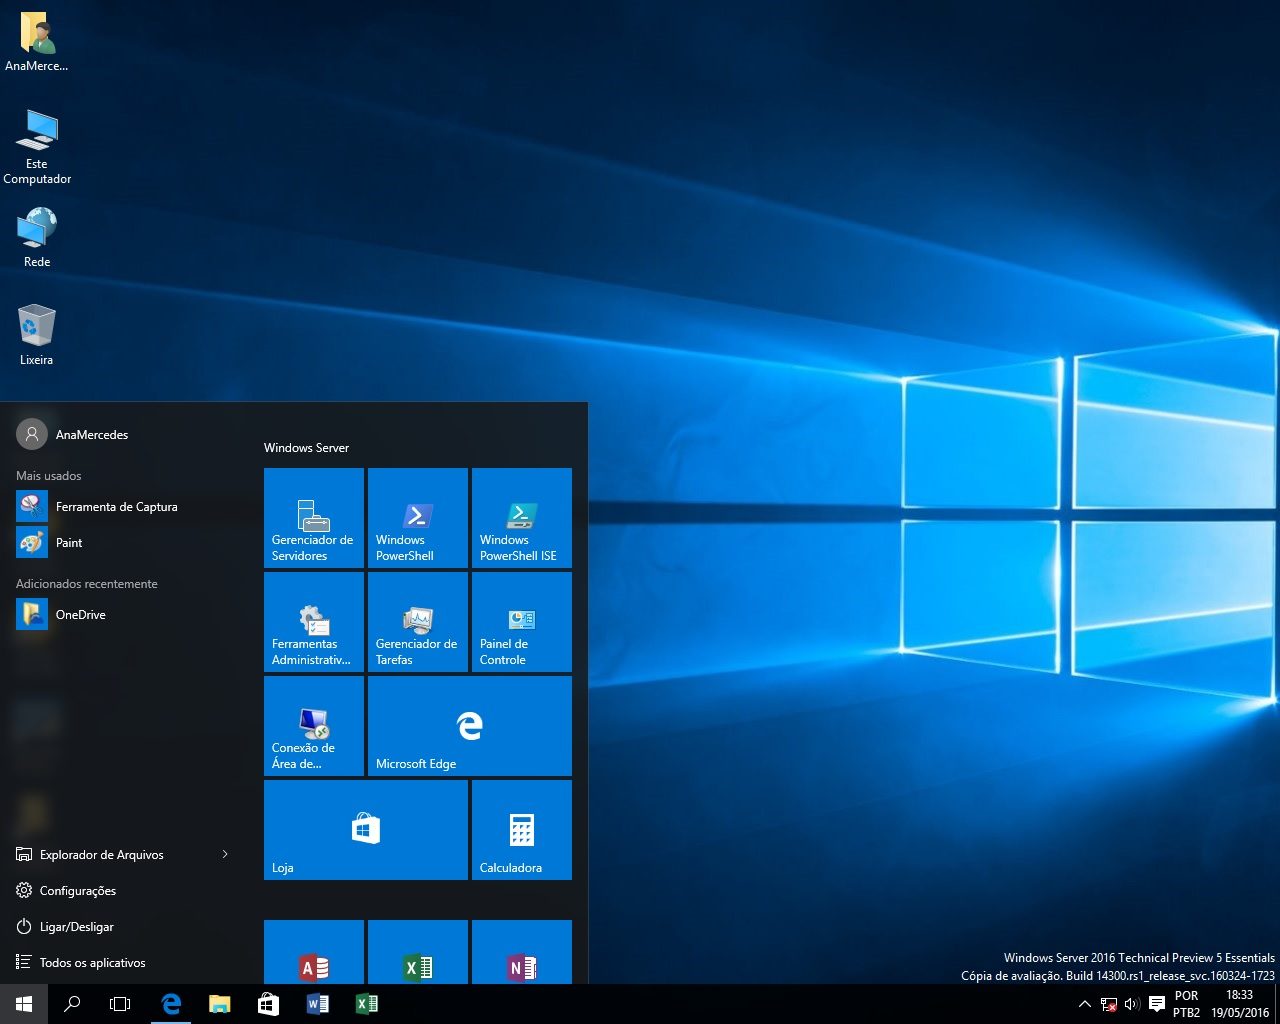 Windows Server 2016 Technical Preview 5 Essentials instalei hoje